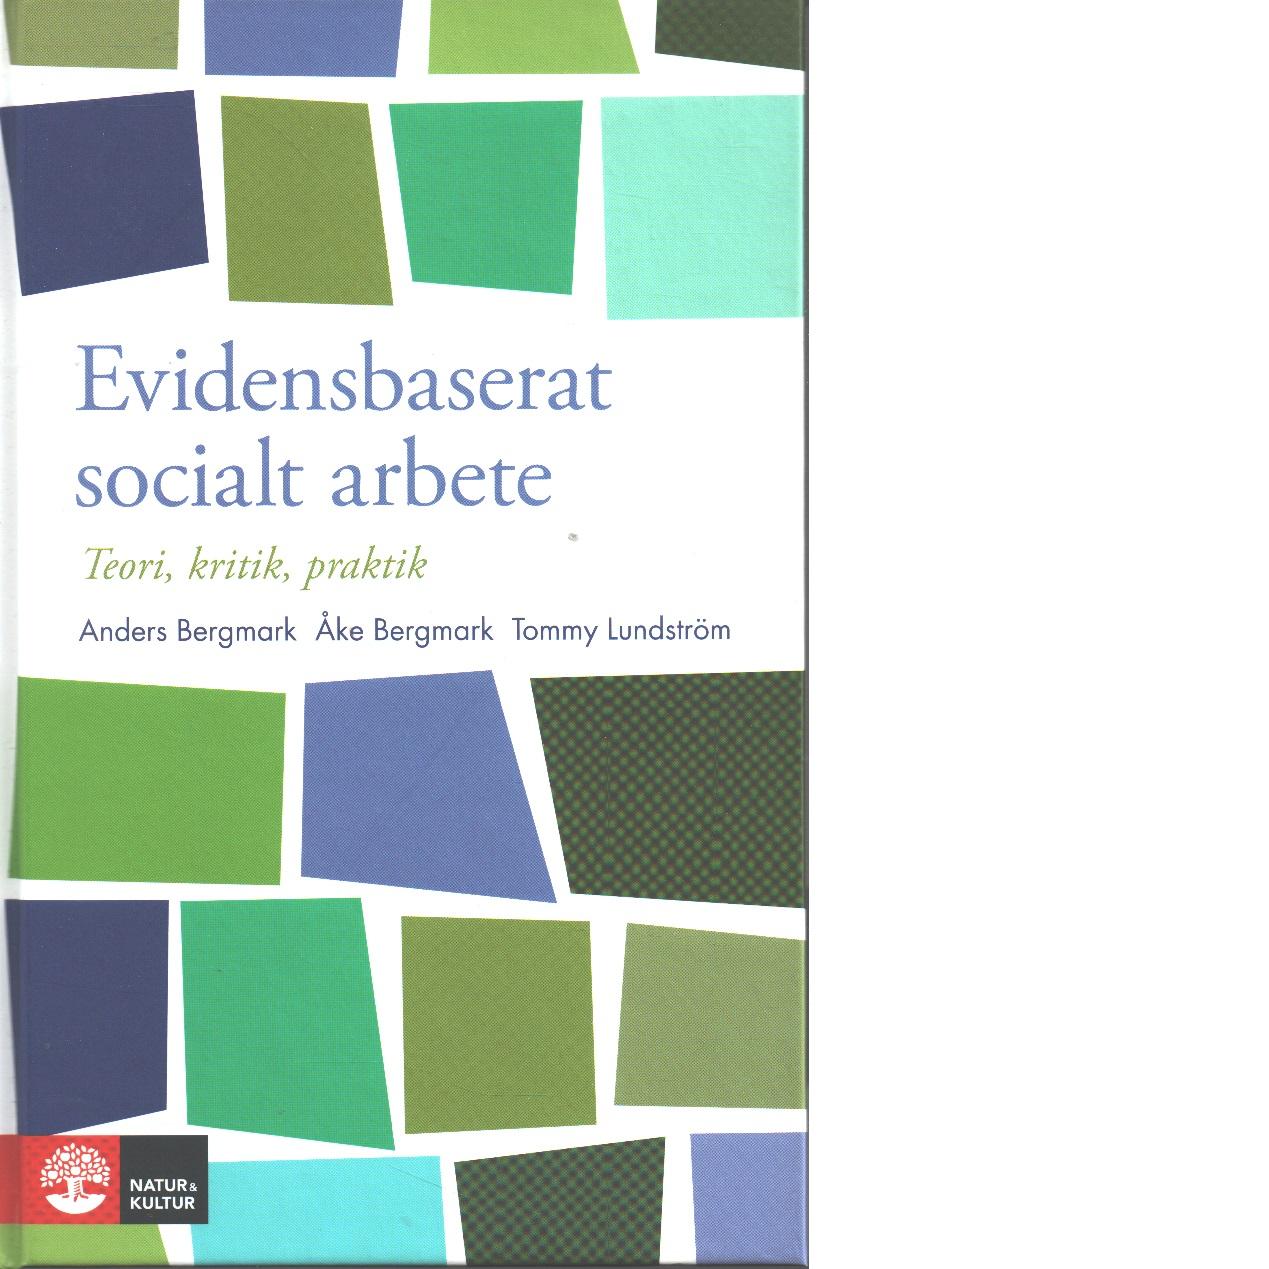 Evidensbaserat socialt arbete : teori, kritik, praktik - Bergmark, Anders och Bergmark, Åke samt Lundström, Tommy